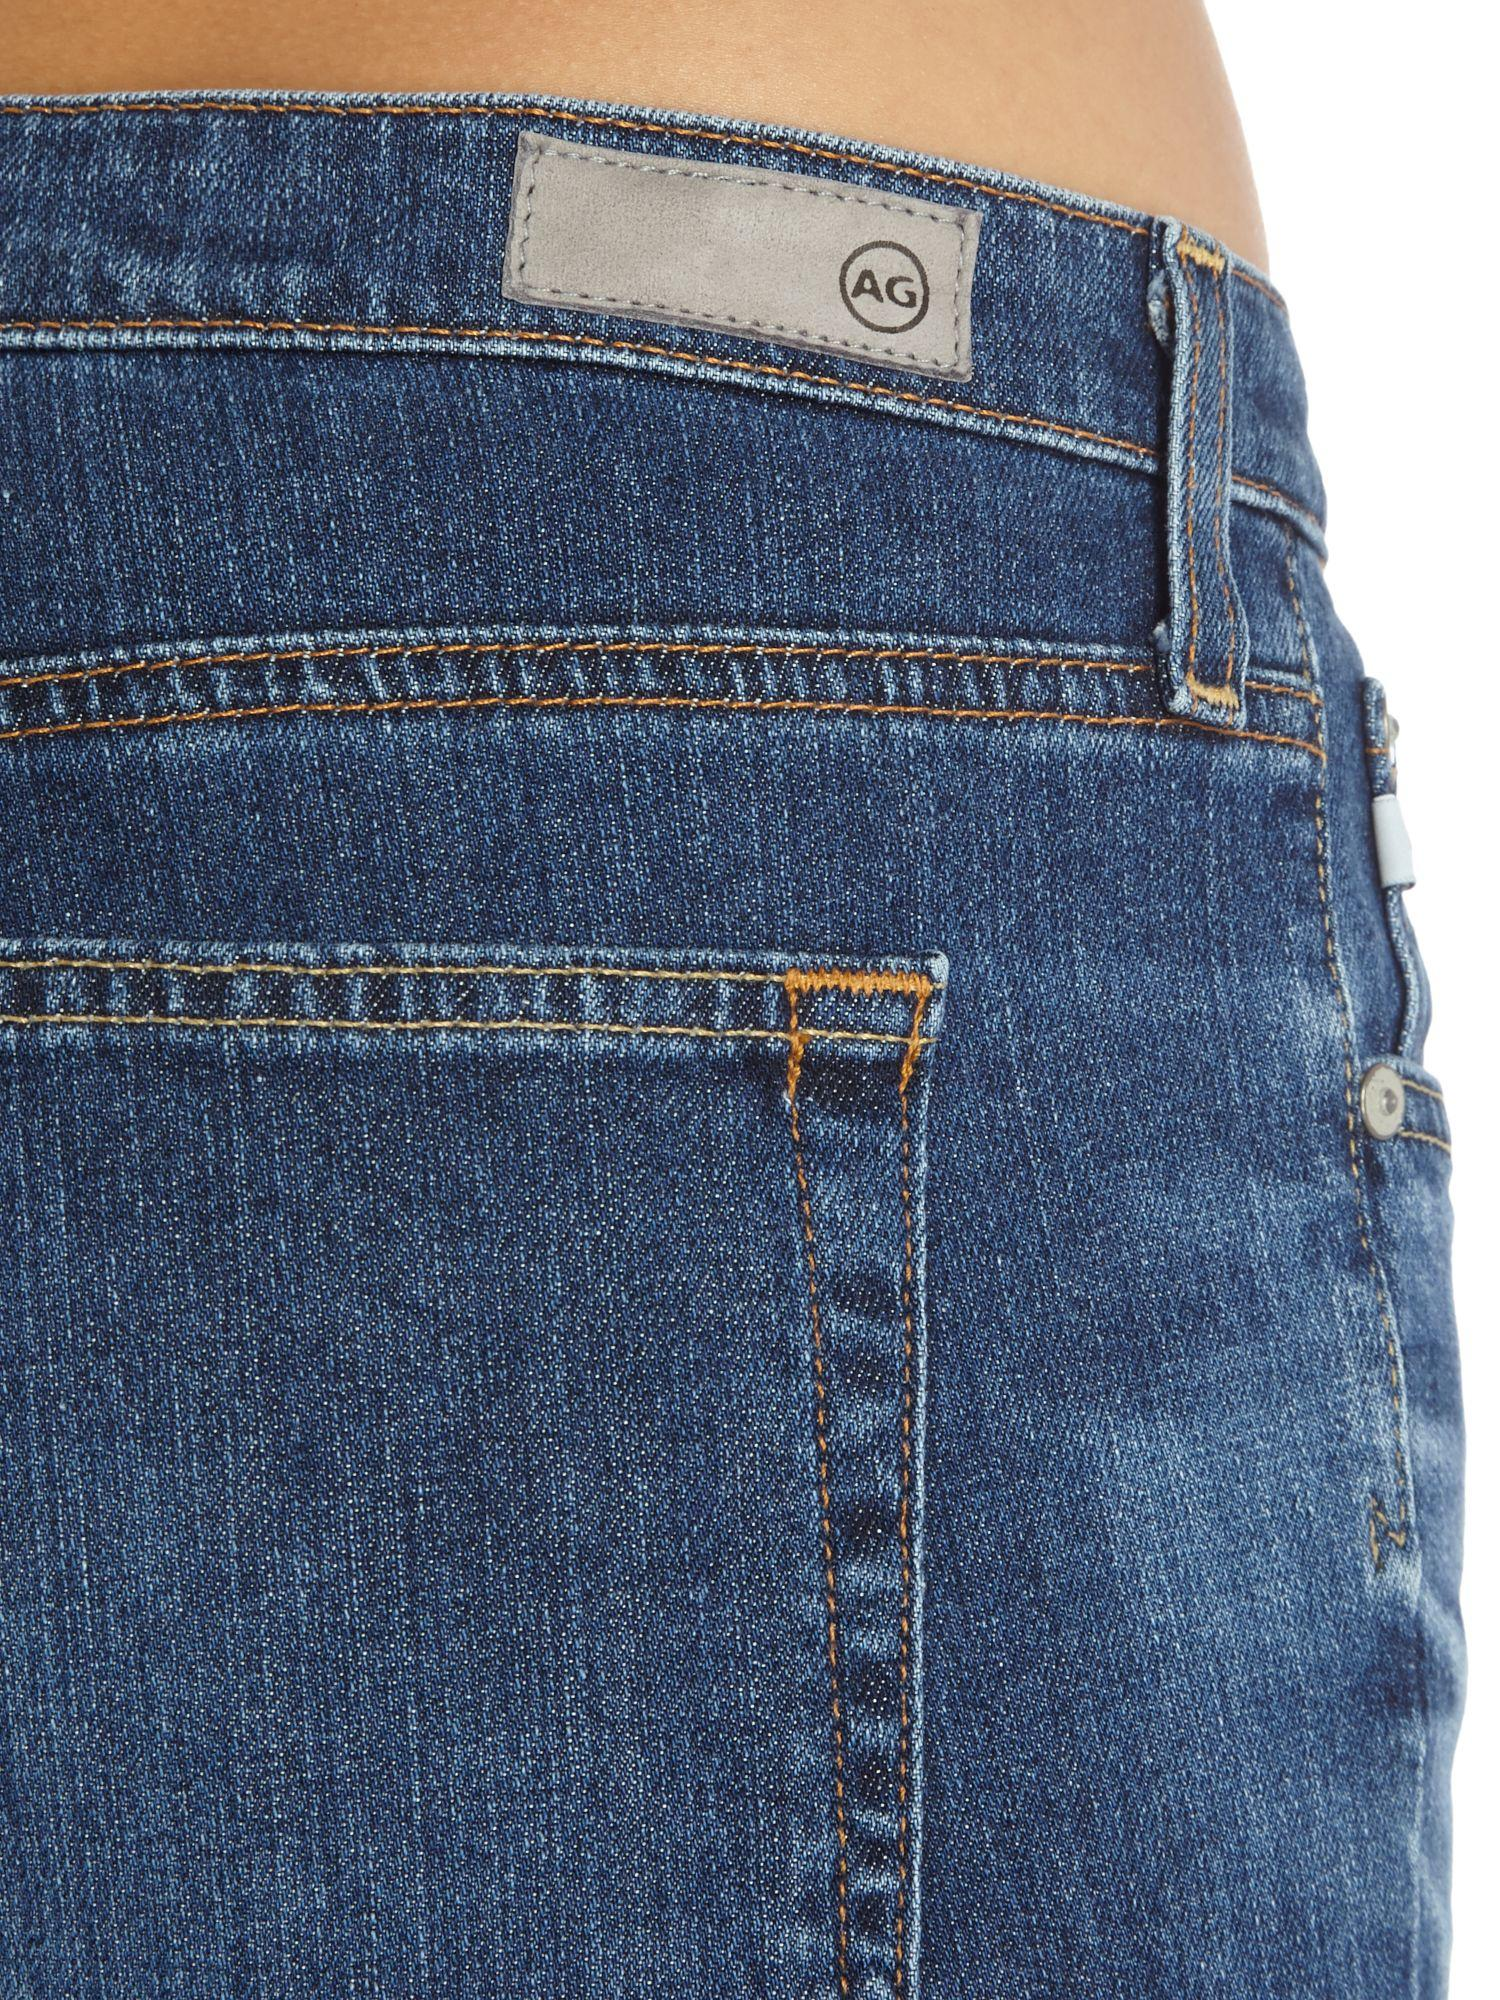 AG Jeans Denim Jodi Cropped Mini Flare Jean In 10 Years Wich in Denim Dark Wash (Blue)